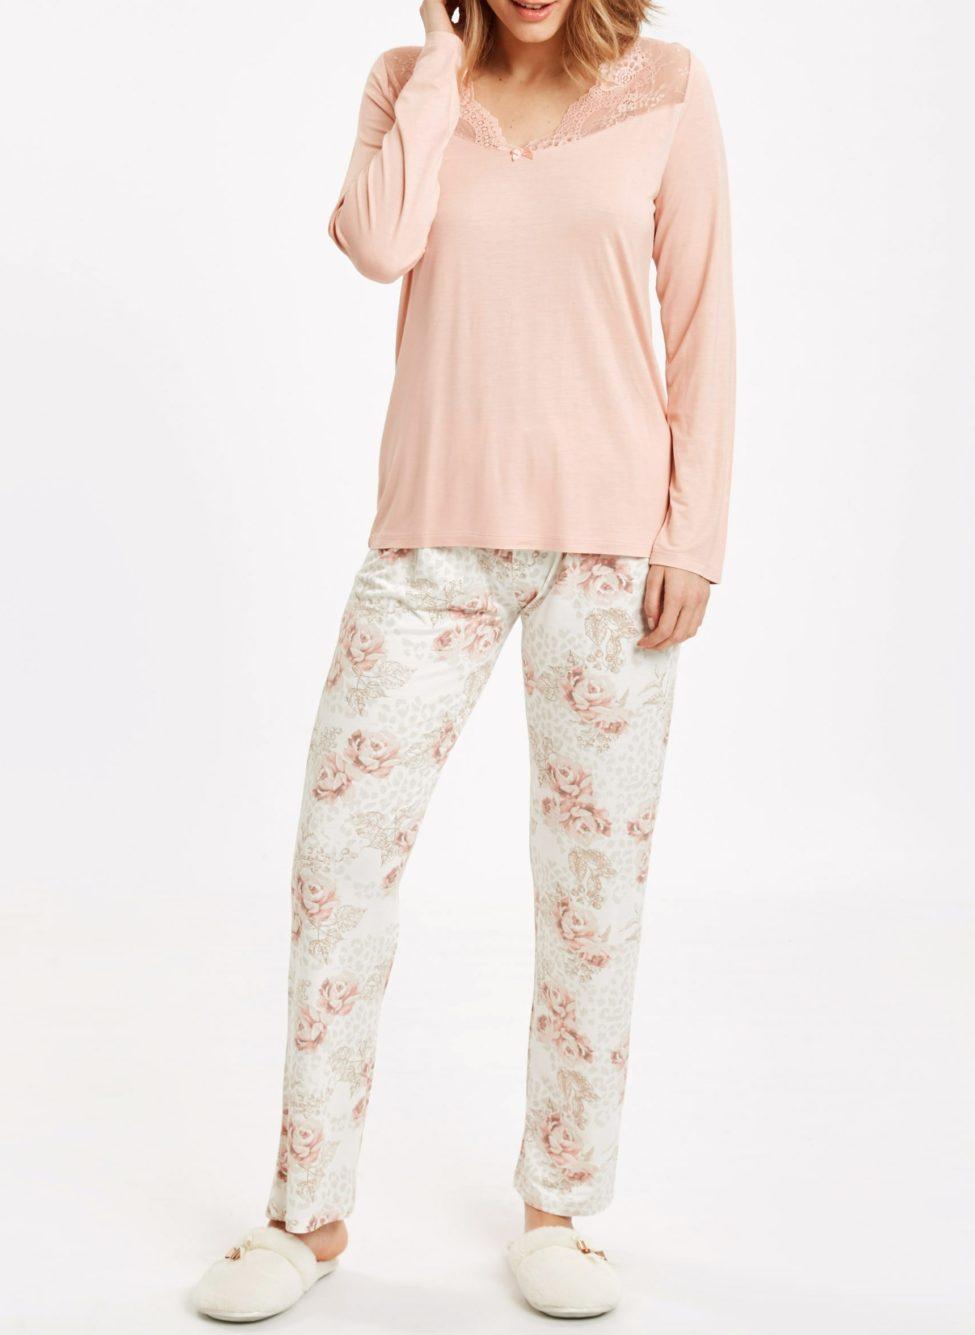 Soldes Lc Waikiki Maroc Pyjama femme 129Dhs au lieu de 259Dhs